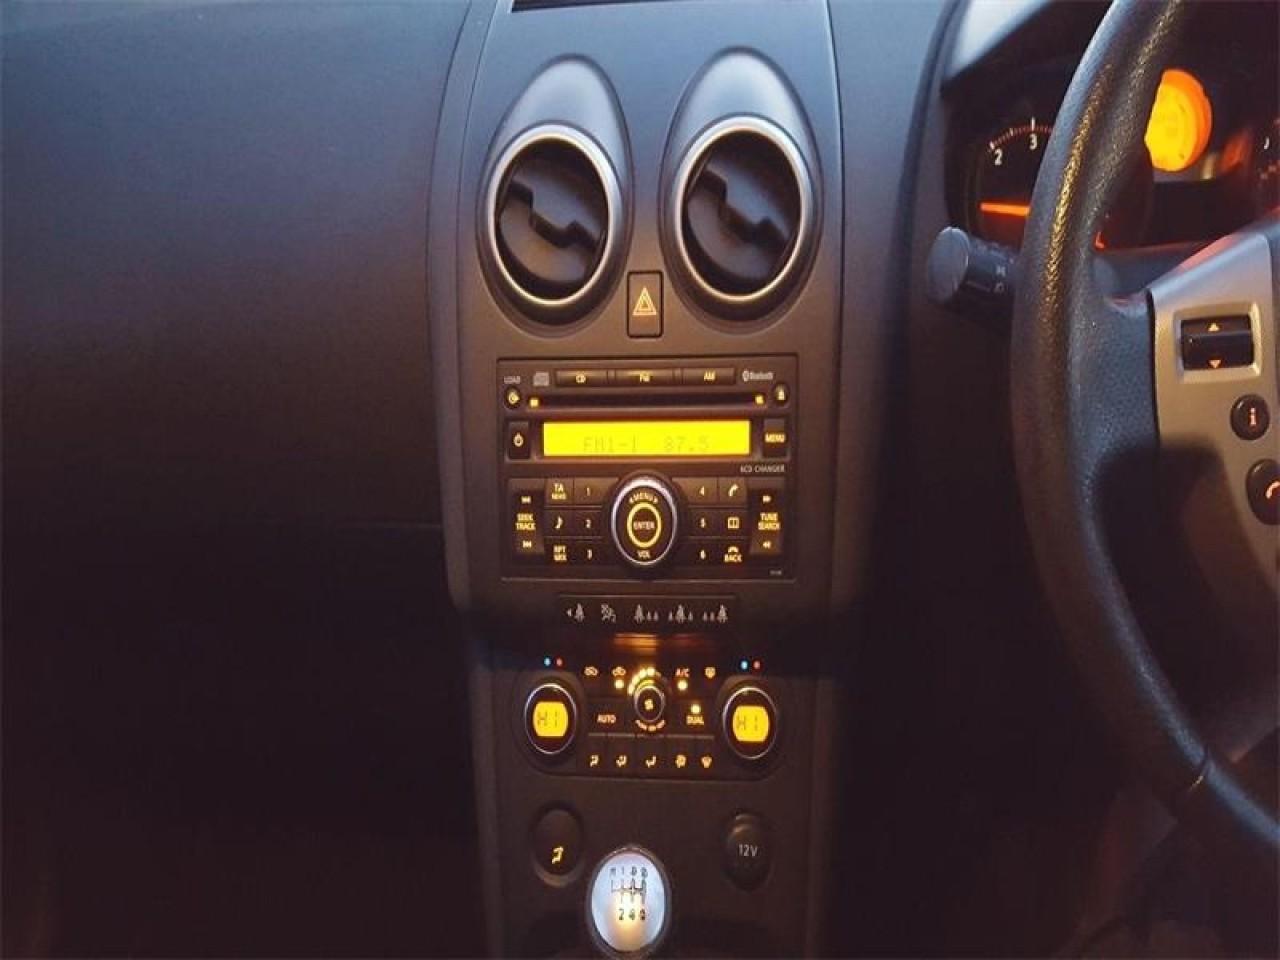 Pompa servodirectie Nissan Qashqai 2007 SUV 2.0D